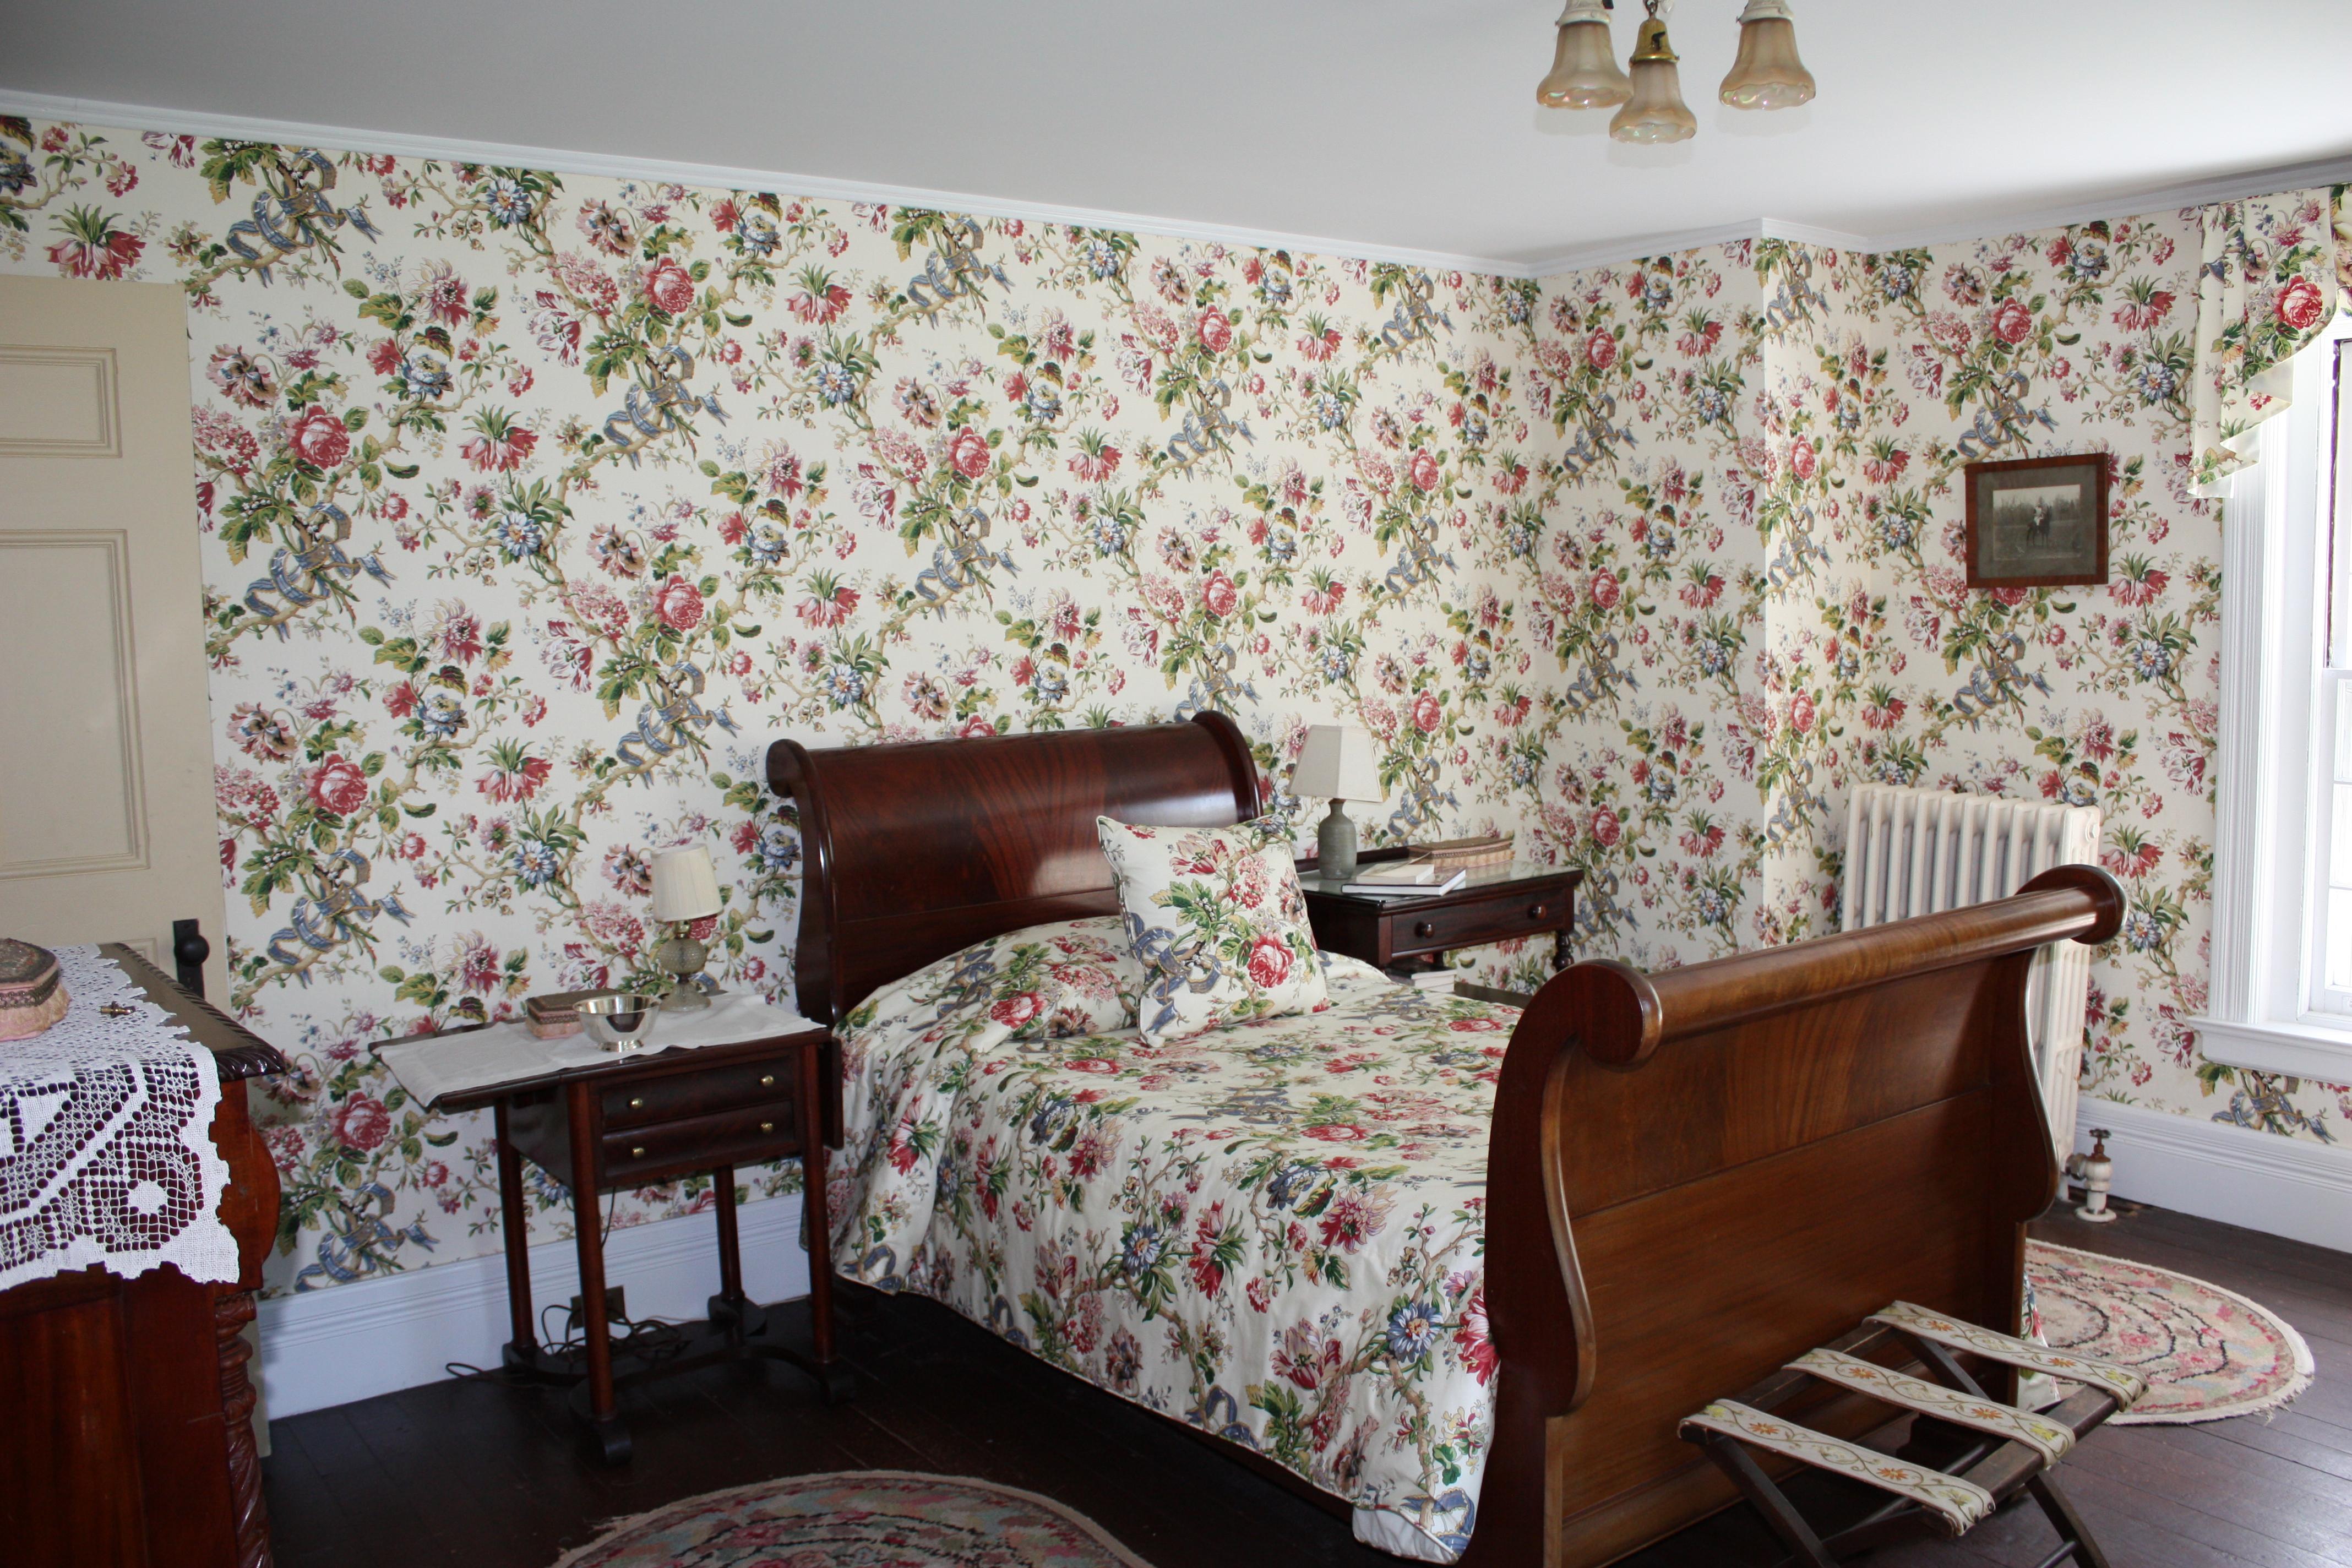 family bedrooms in an 1880s lodge let s face the music rh charlieandjo wordpress com 1980s bathroom decor 1980s bathroom decor